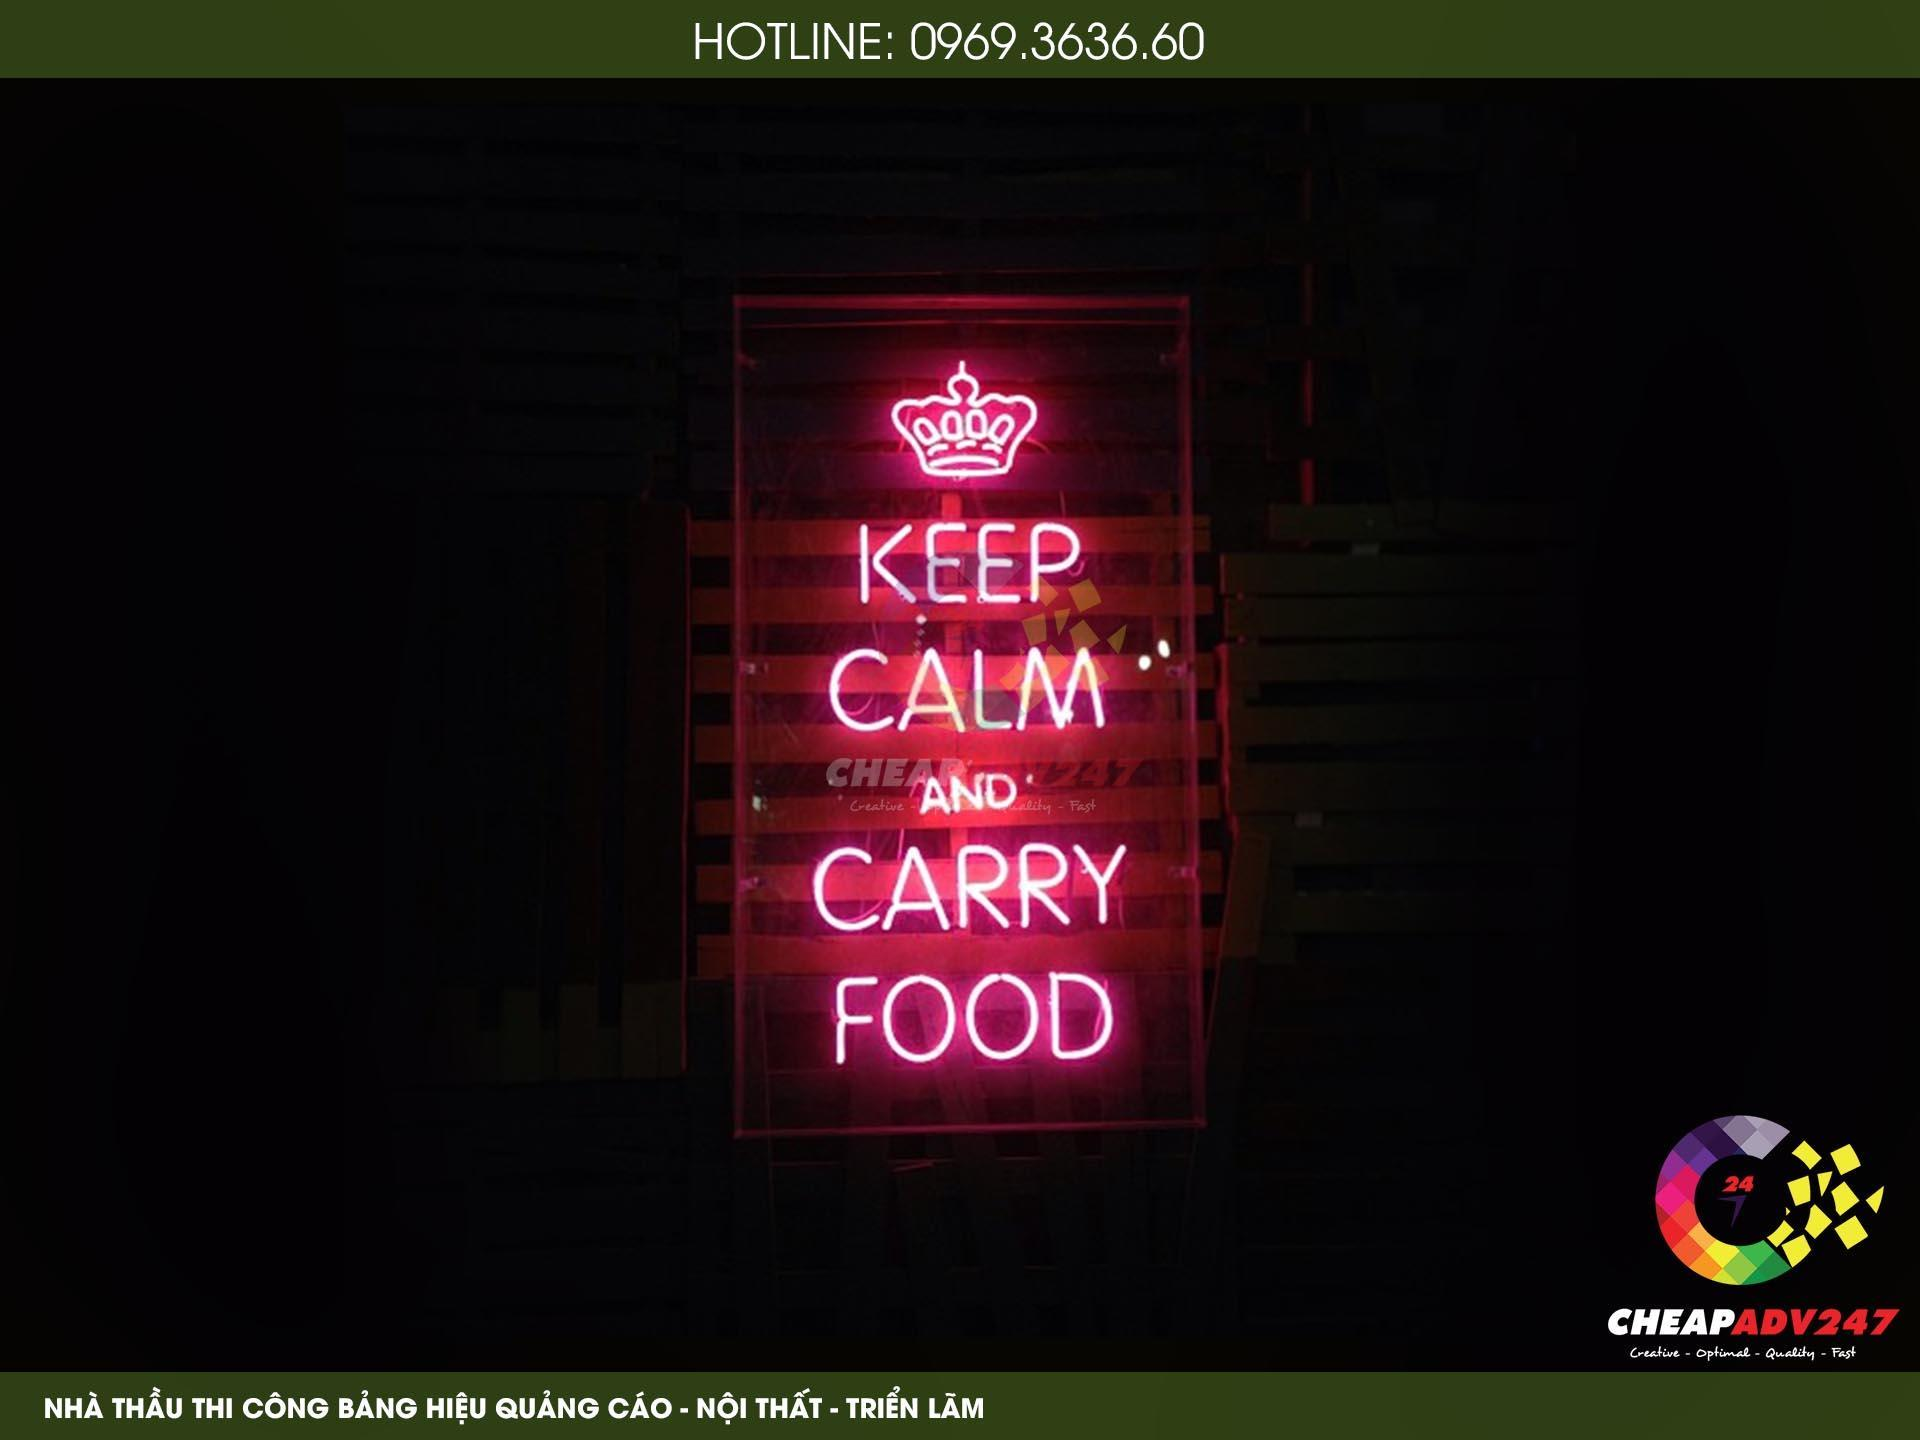 Làm đèn neon sign tại cheapadv247 - ảnh 2